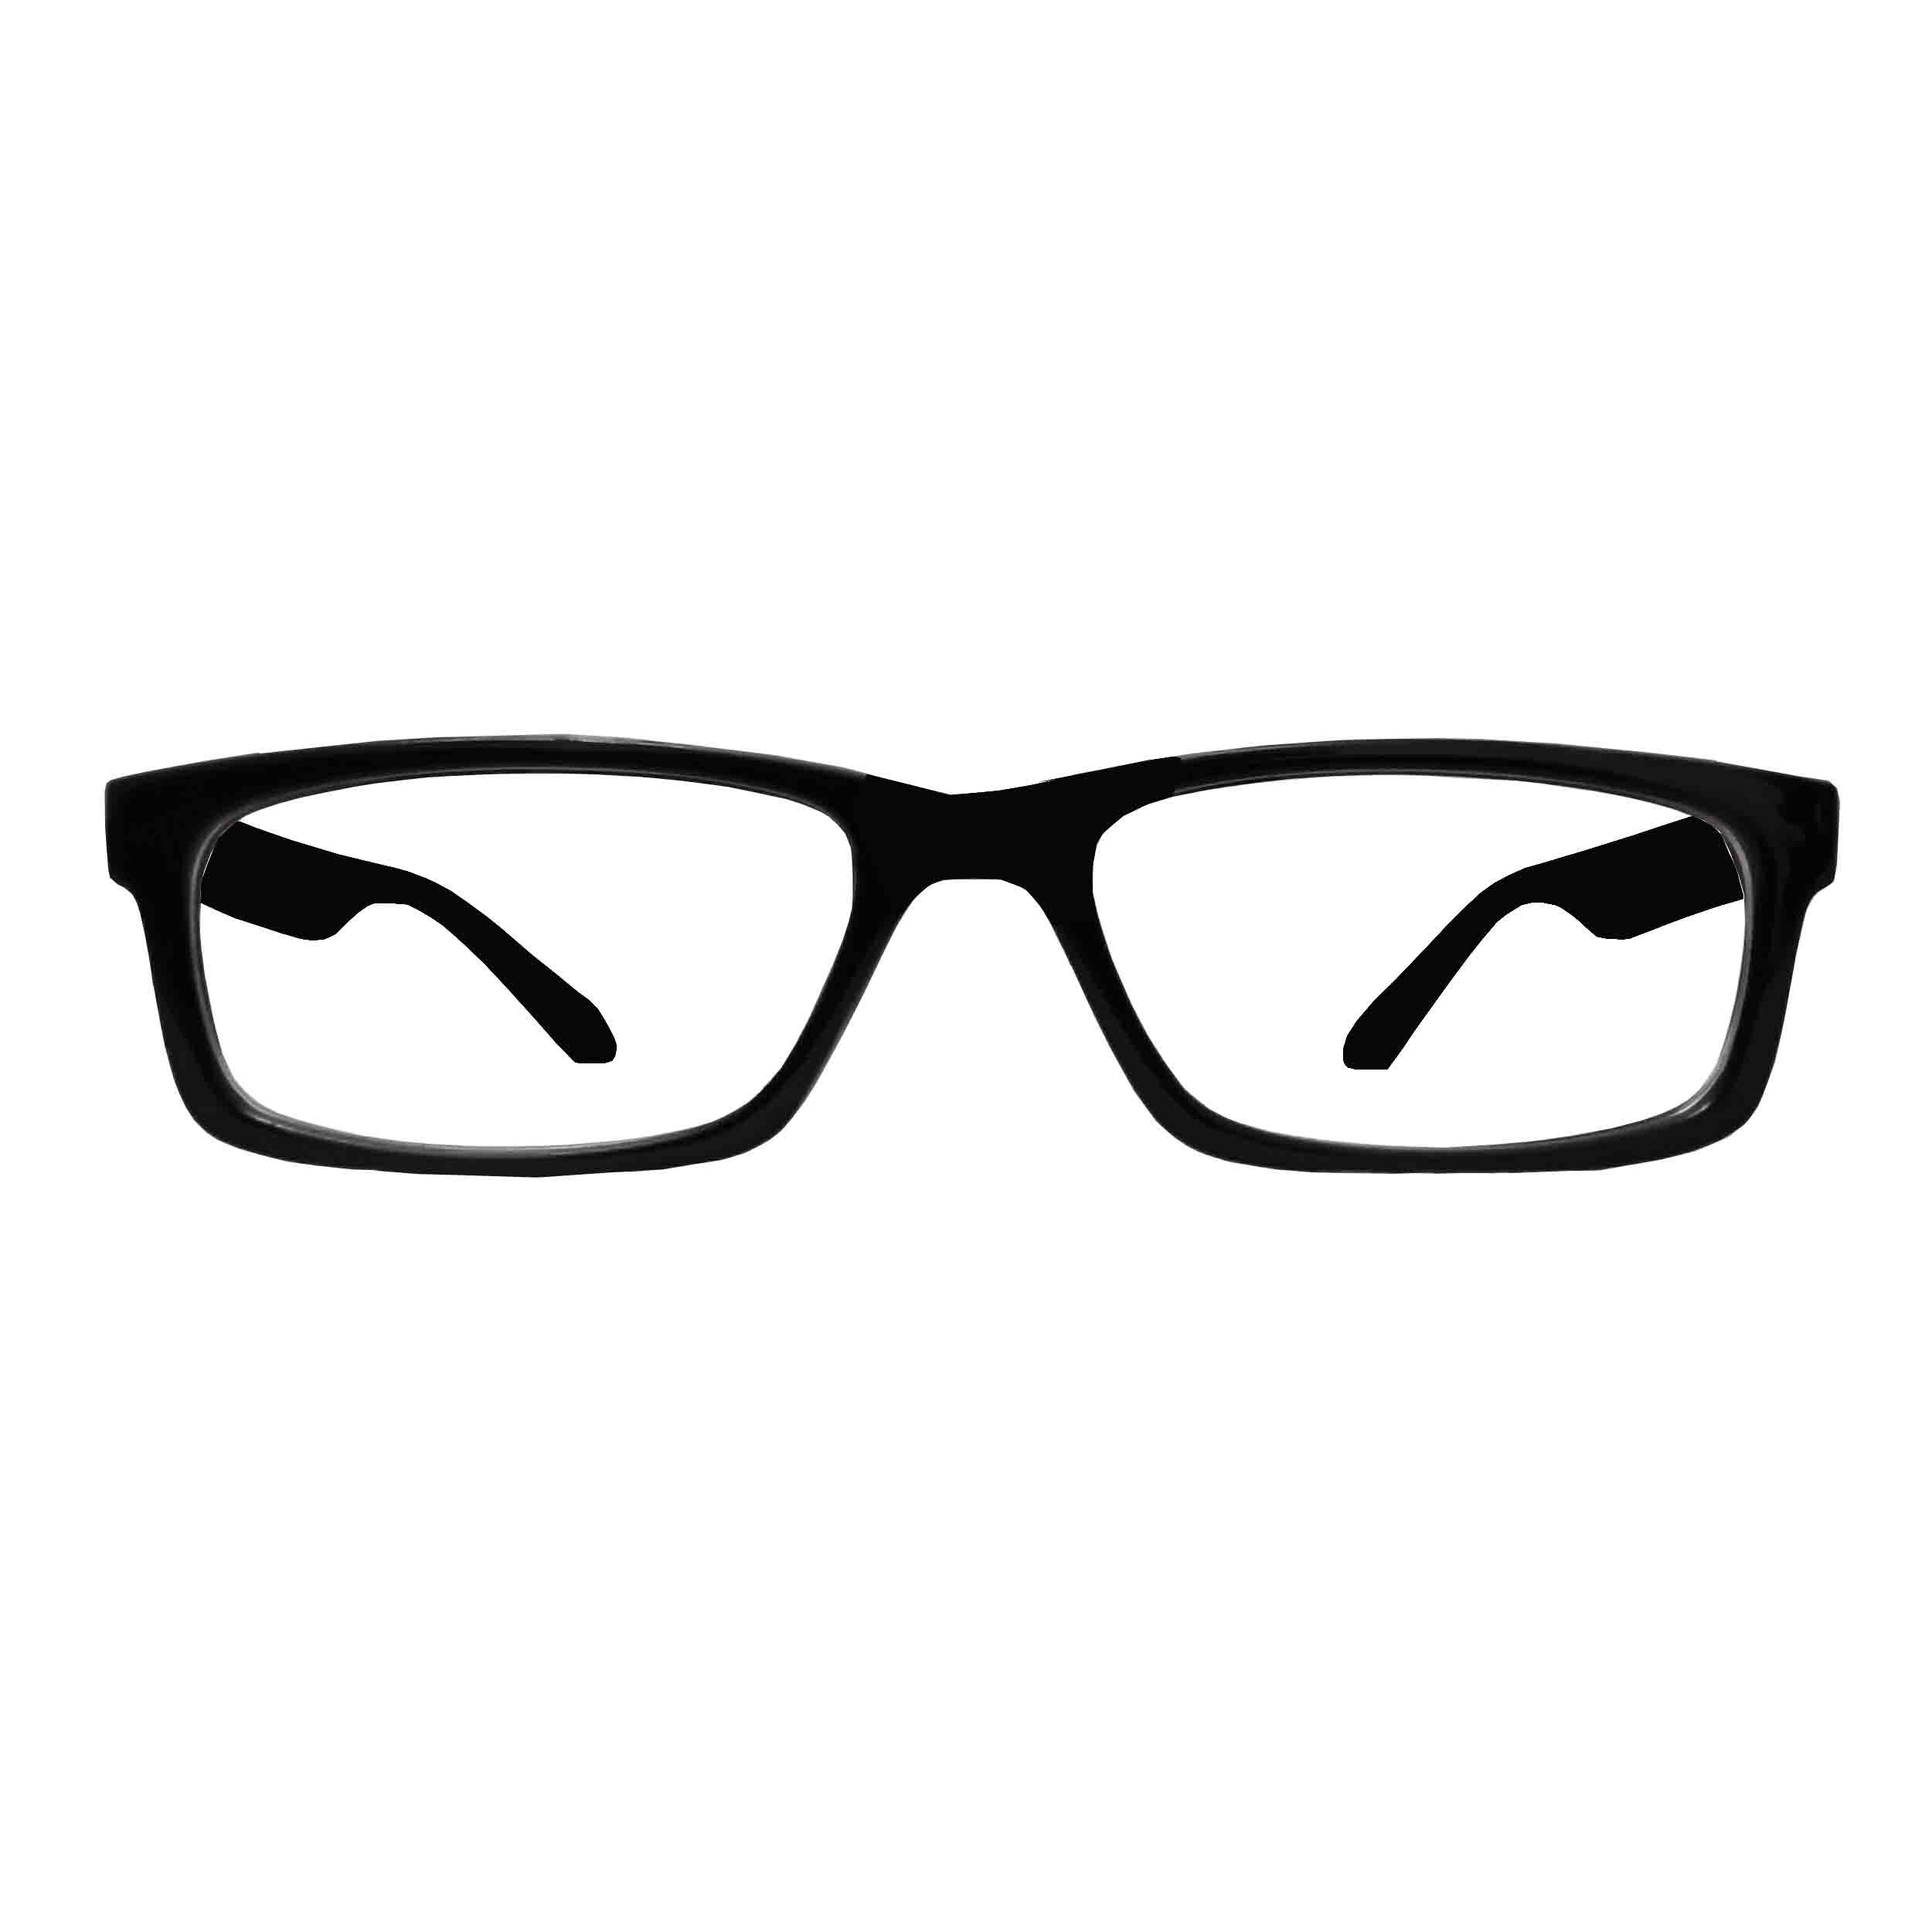 فریم عینک طبی کد 62441